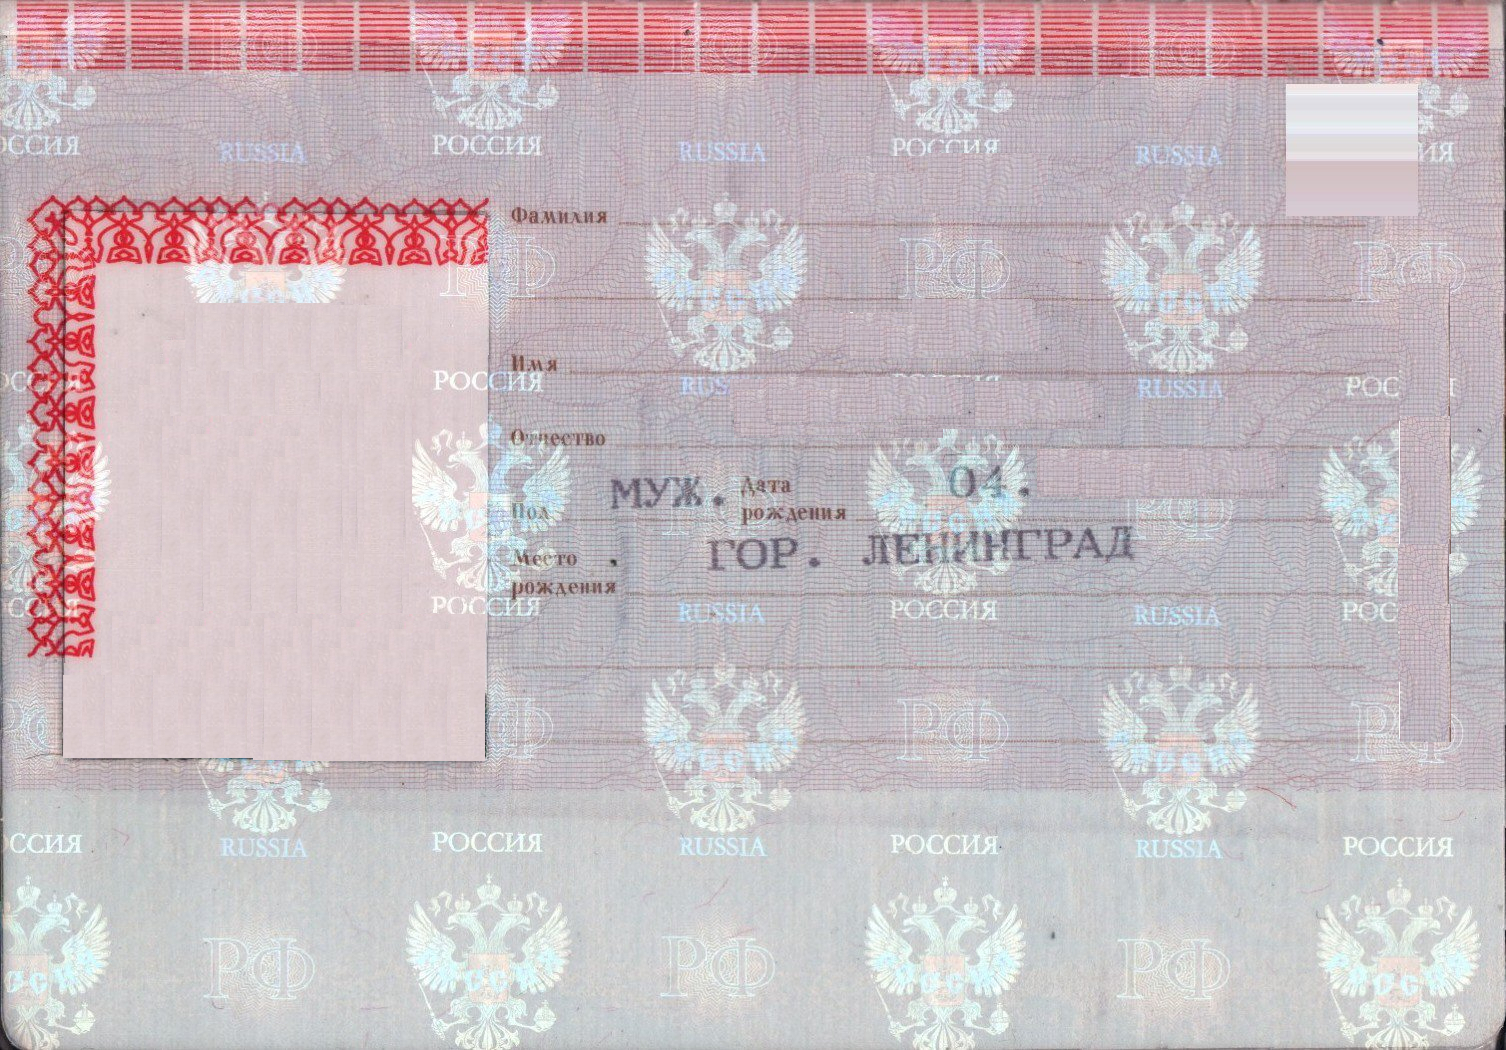 паспорт гражданина рф бланки